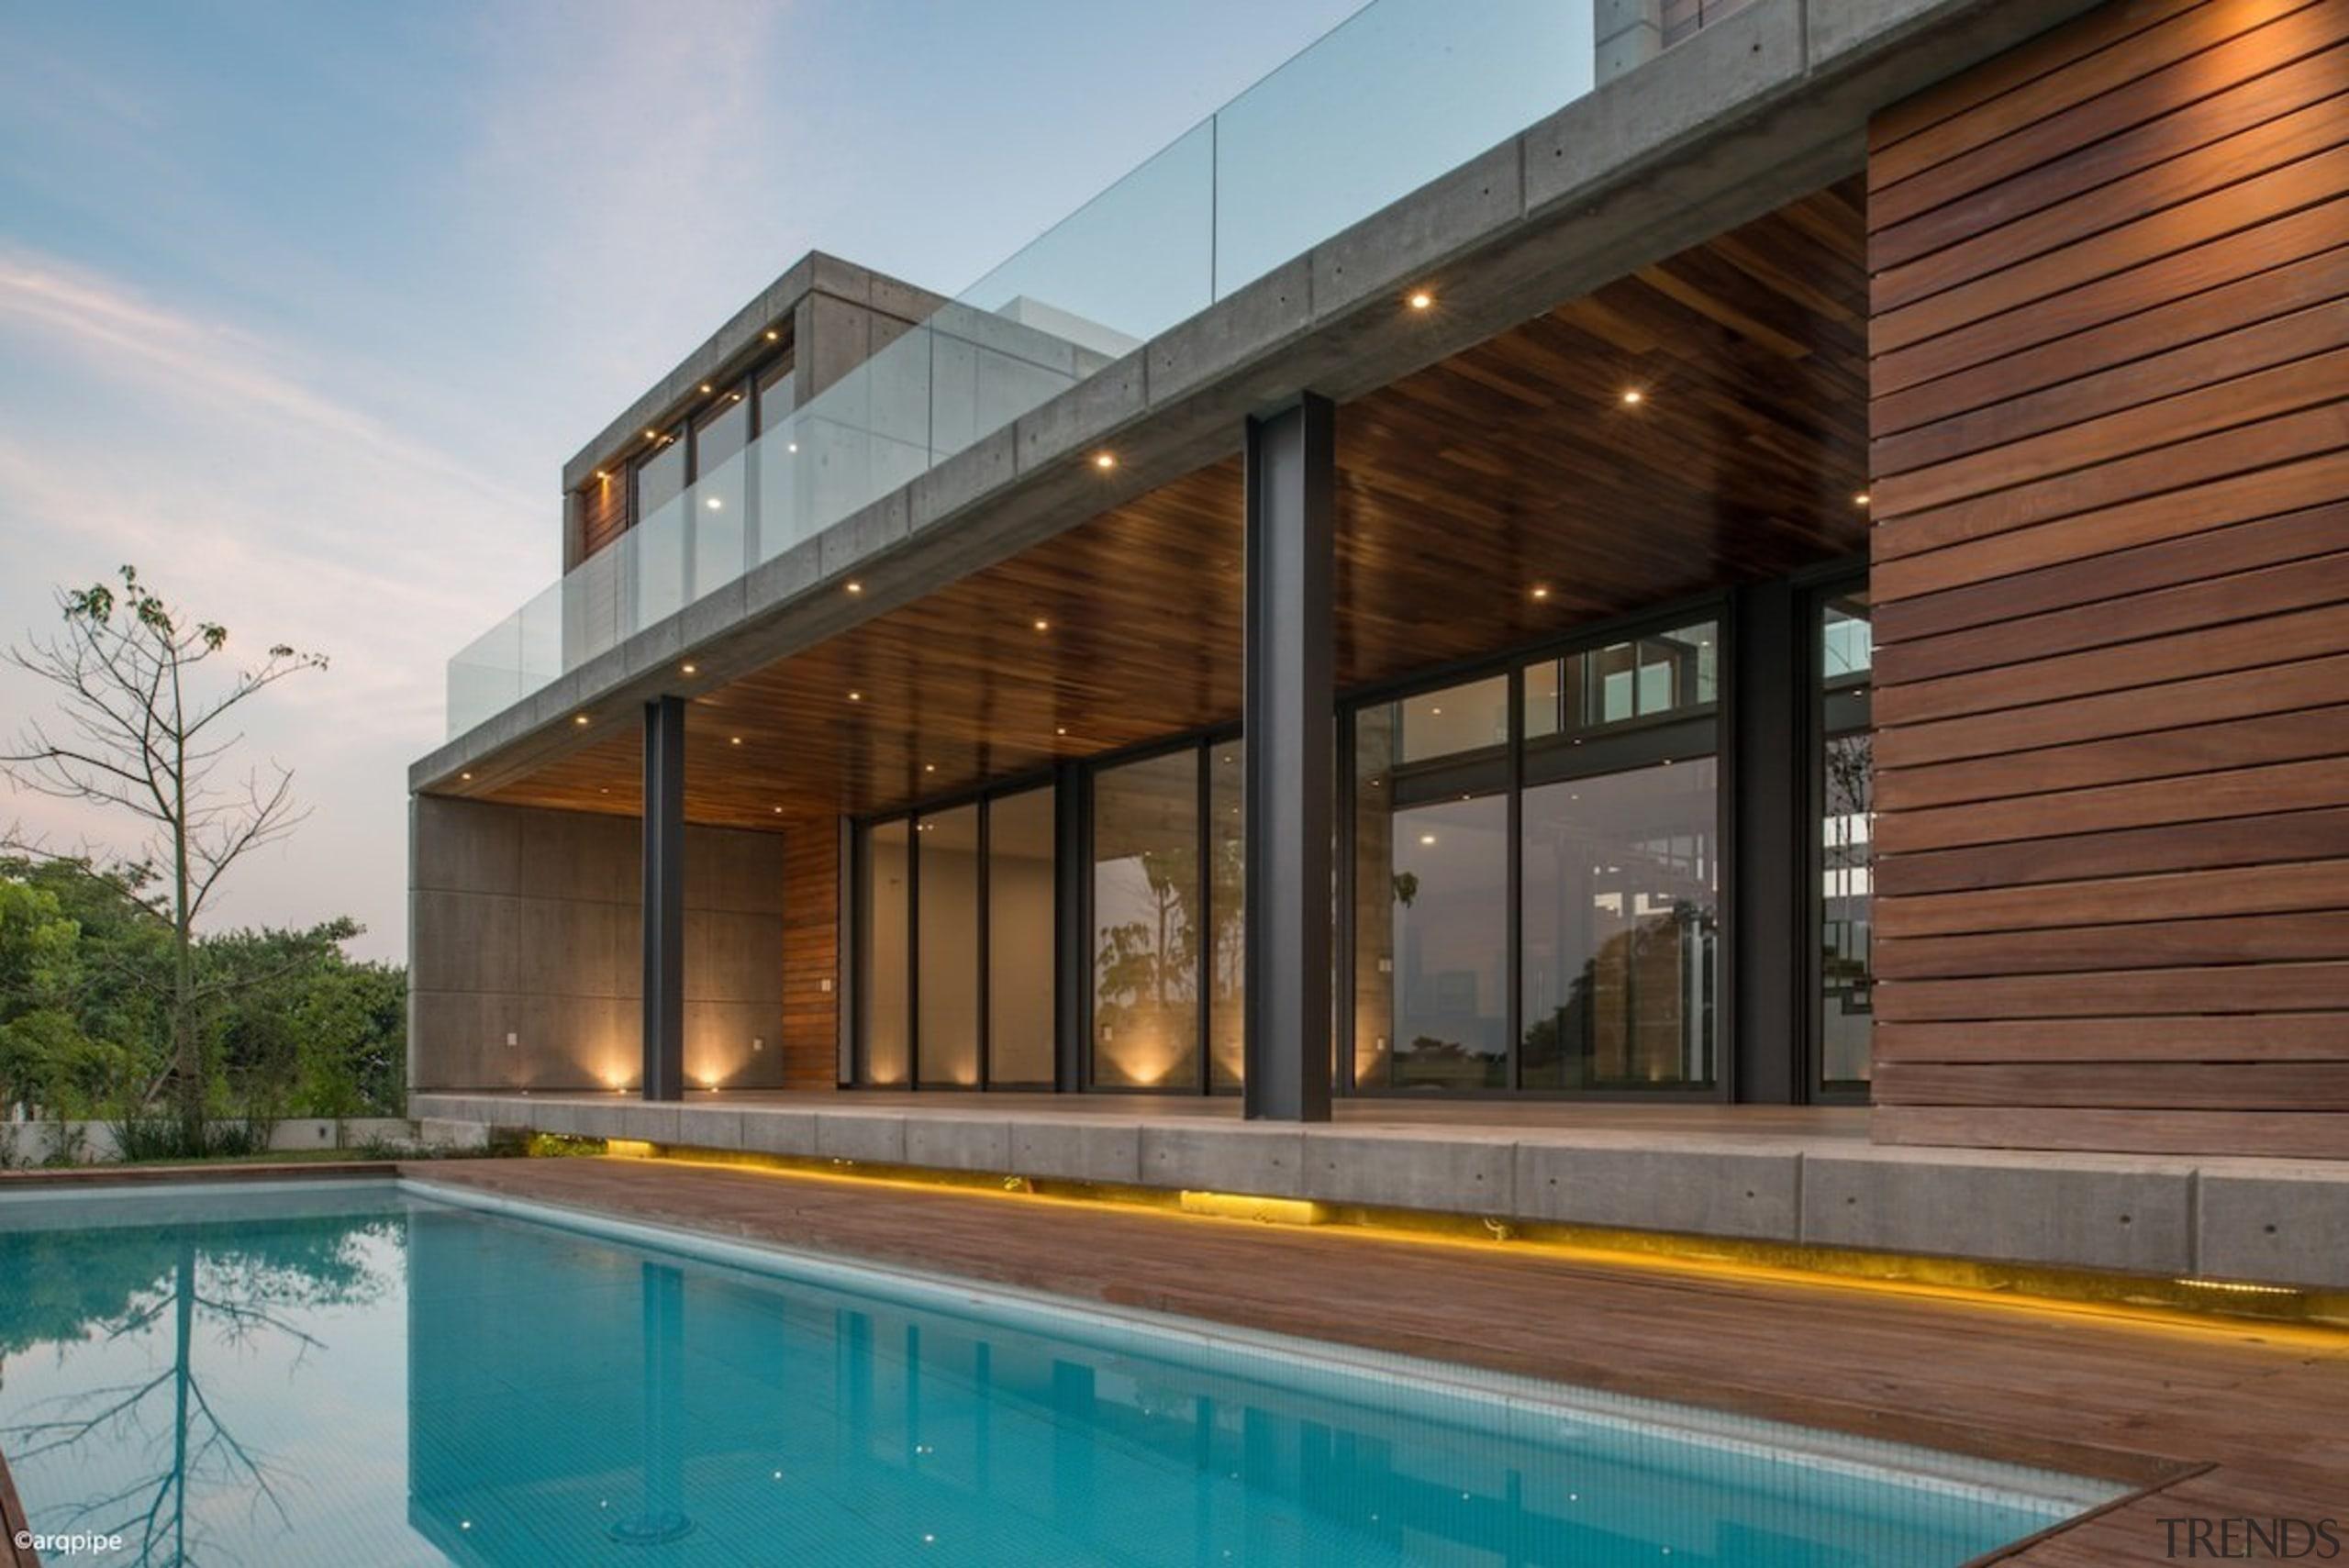 Colima home/Di Frenna Arquitectos - Colima home/Di Frenna architecture, estate, facade, home, house, property, real estate, swimming pool, brown, gray